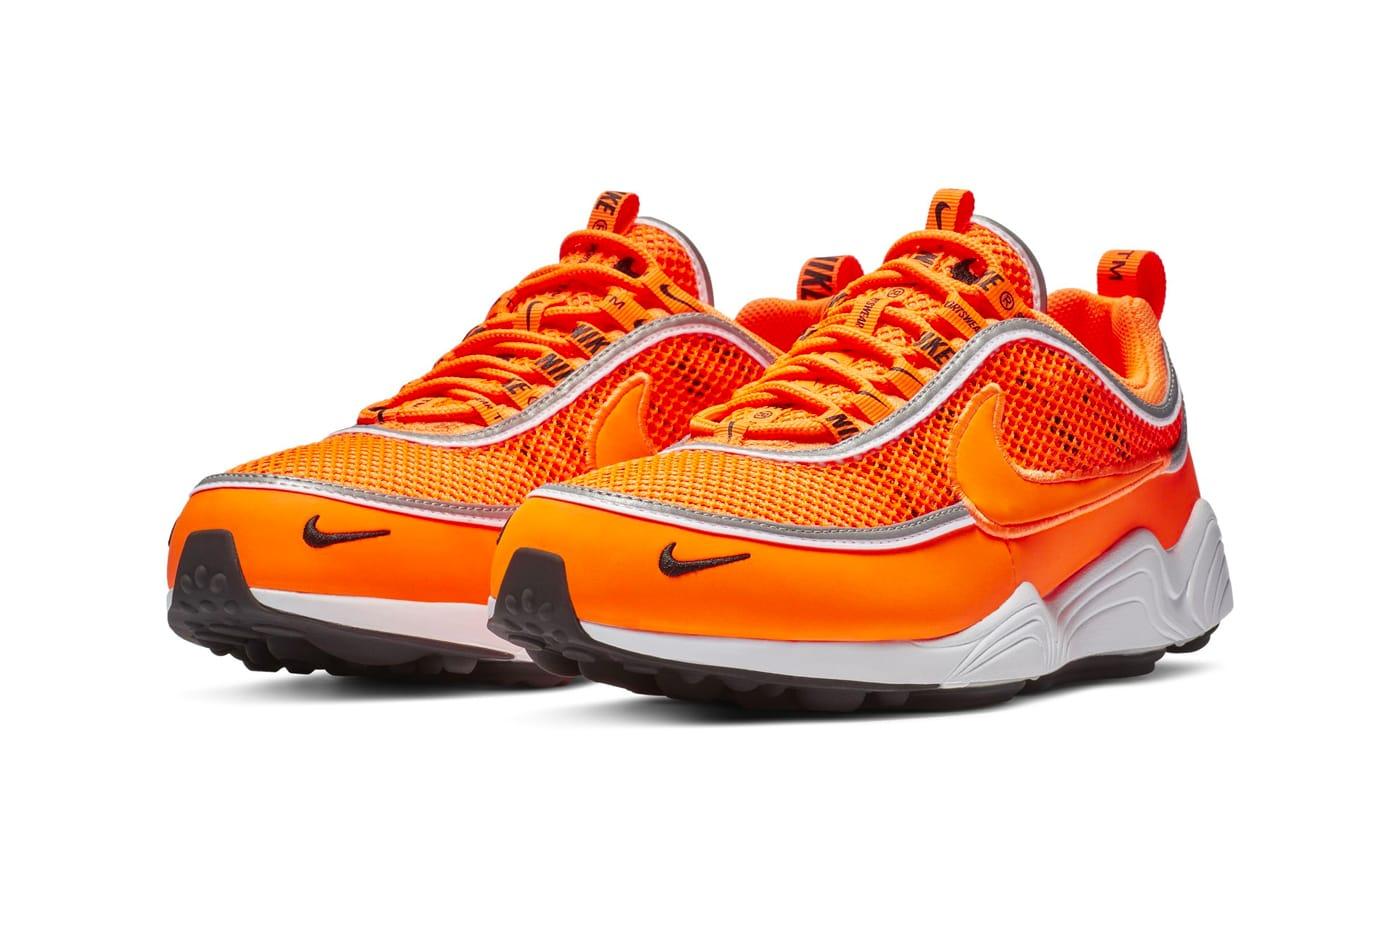 Nike Air Zoom Spiridon Orange Colorway